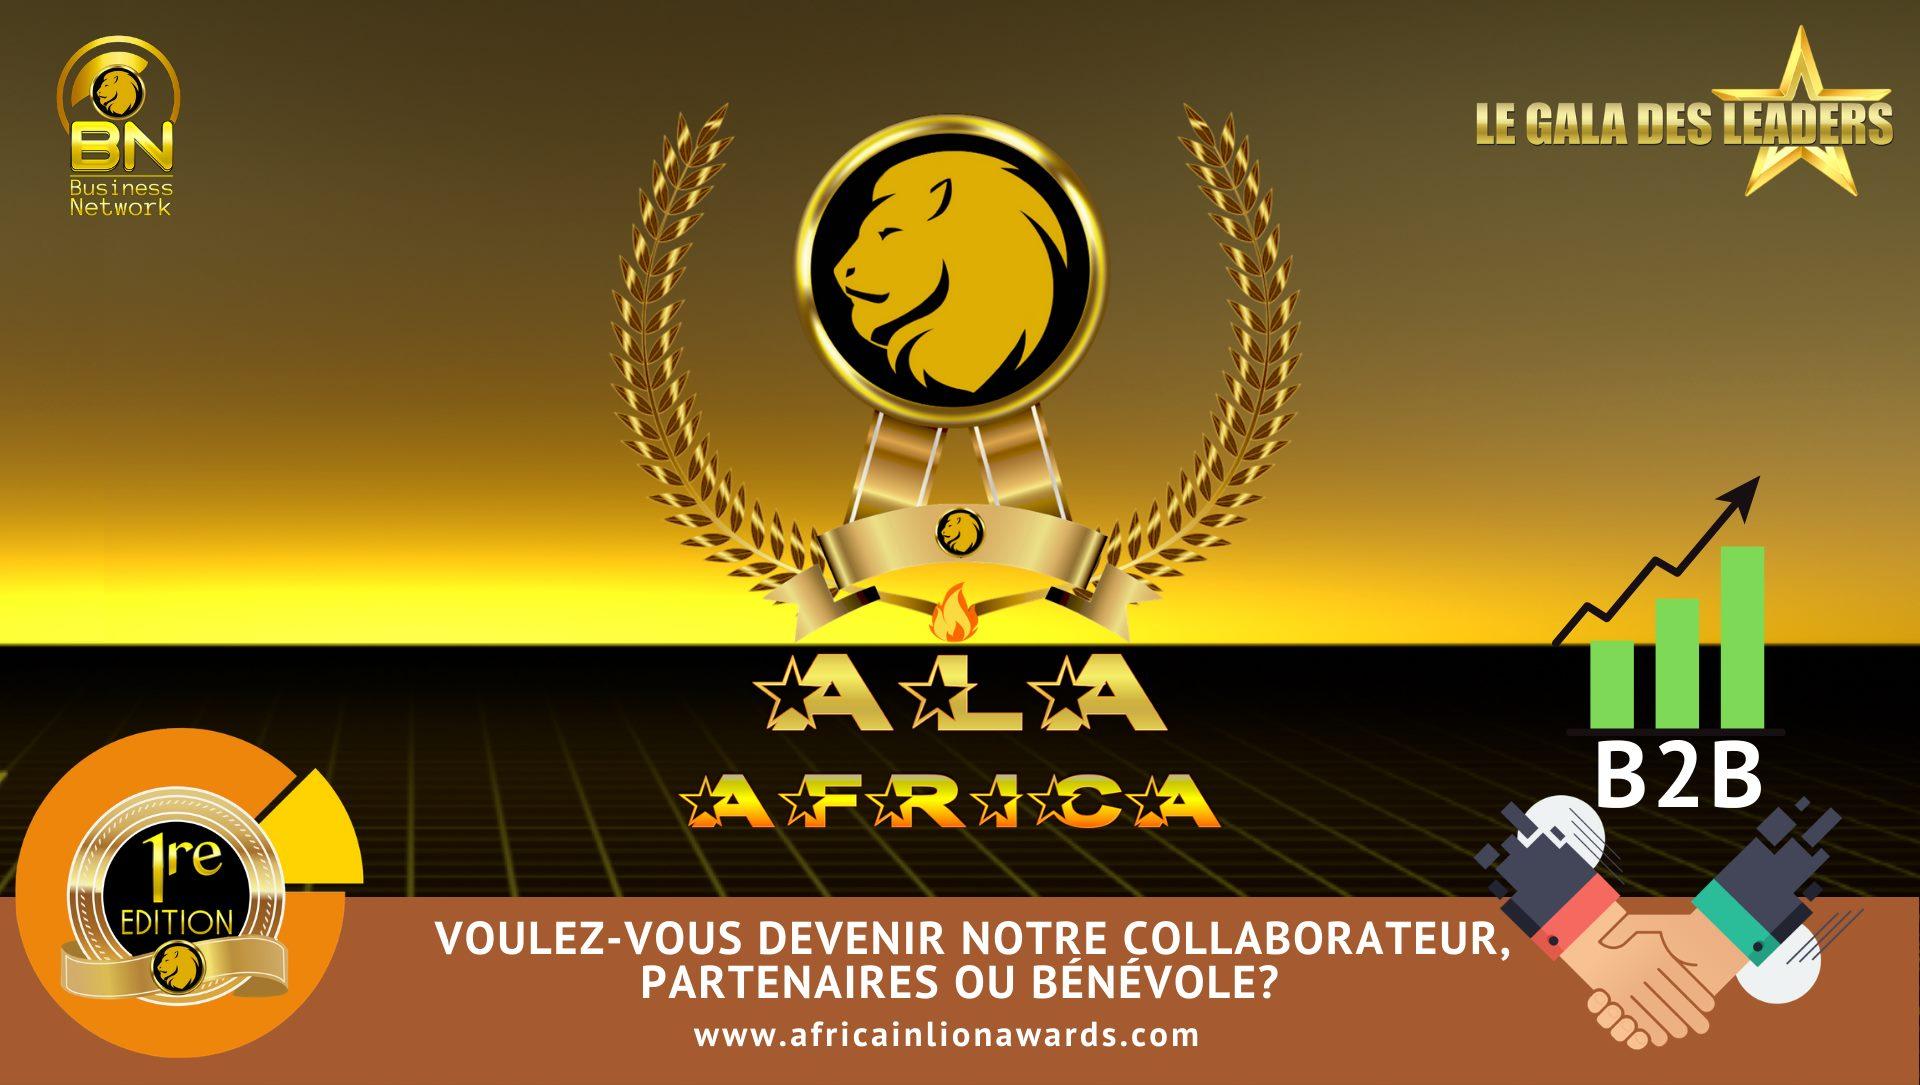 ALA AFRICA 1er édition